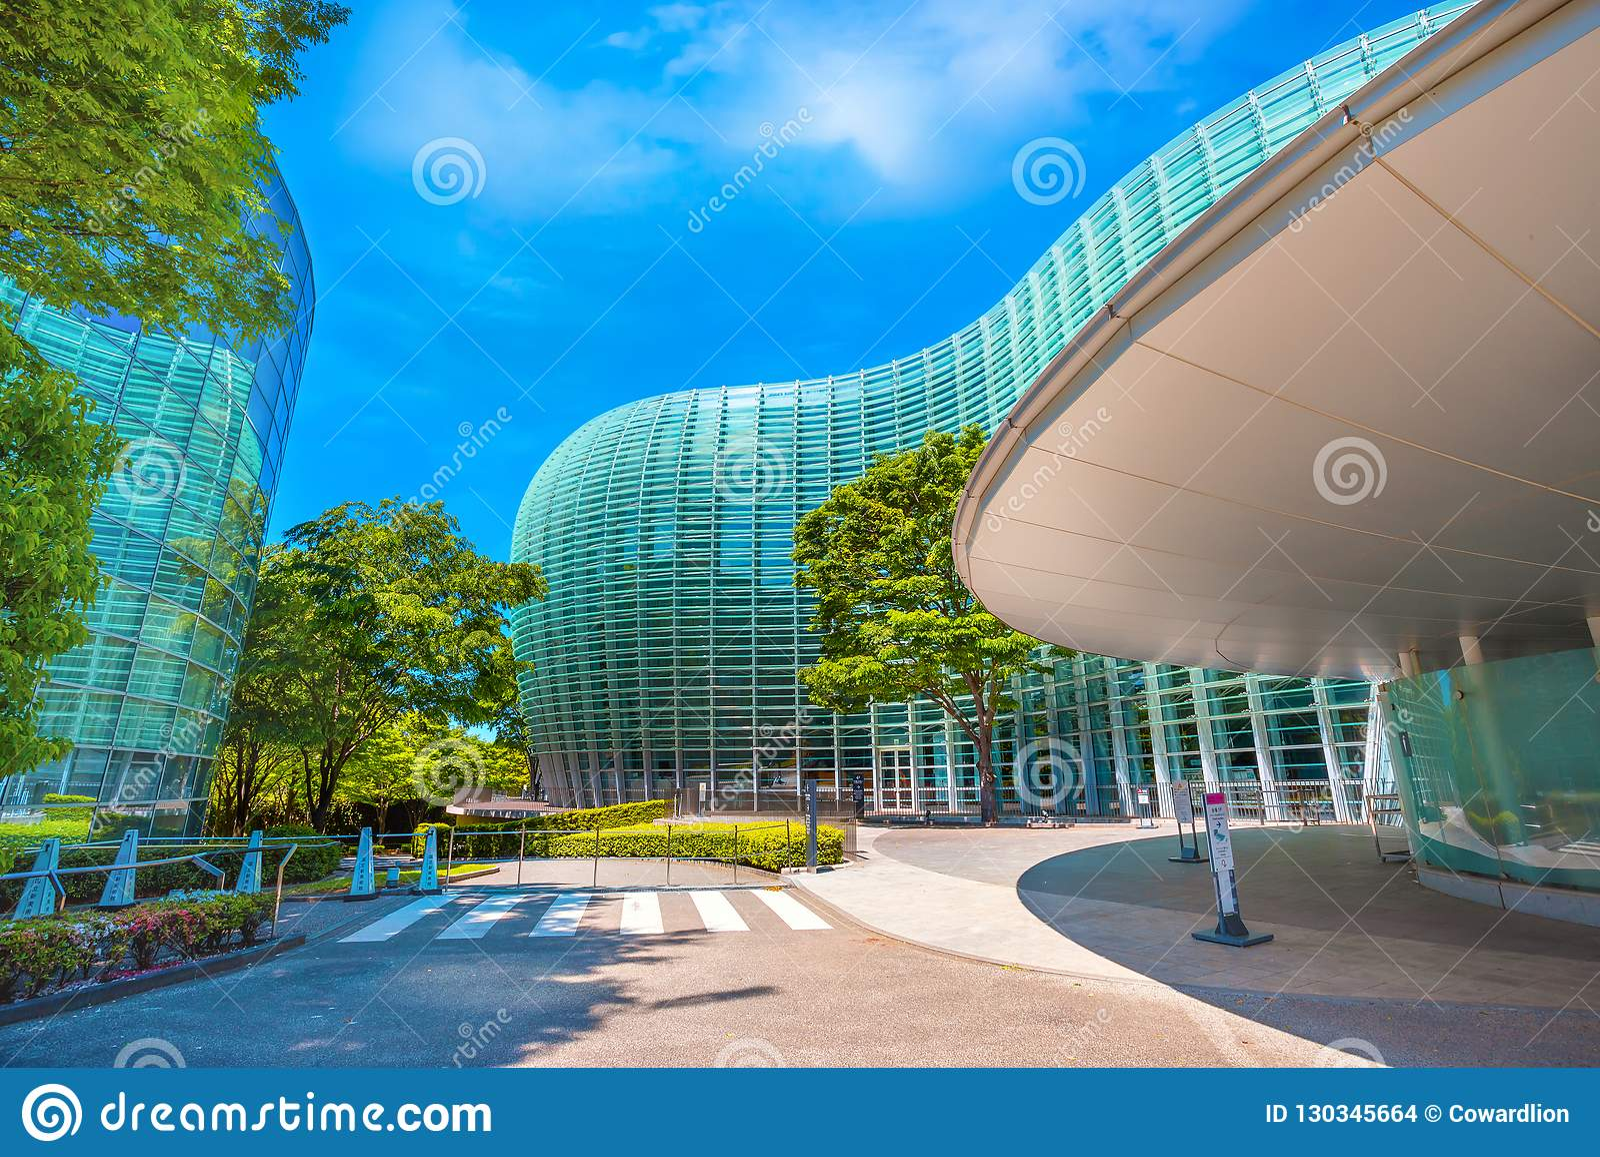 Art Center national dans Roppongi, Tokyo, Japon